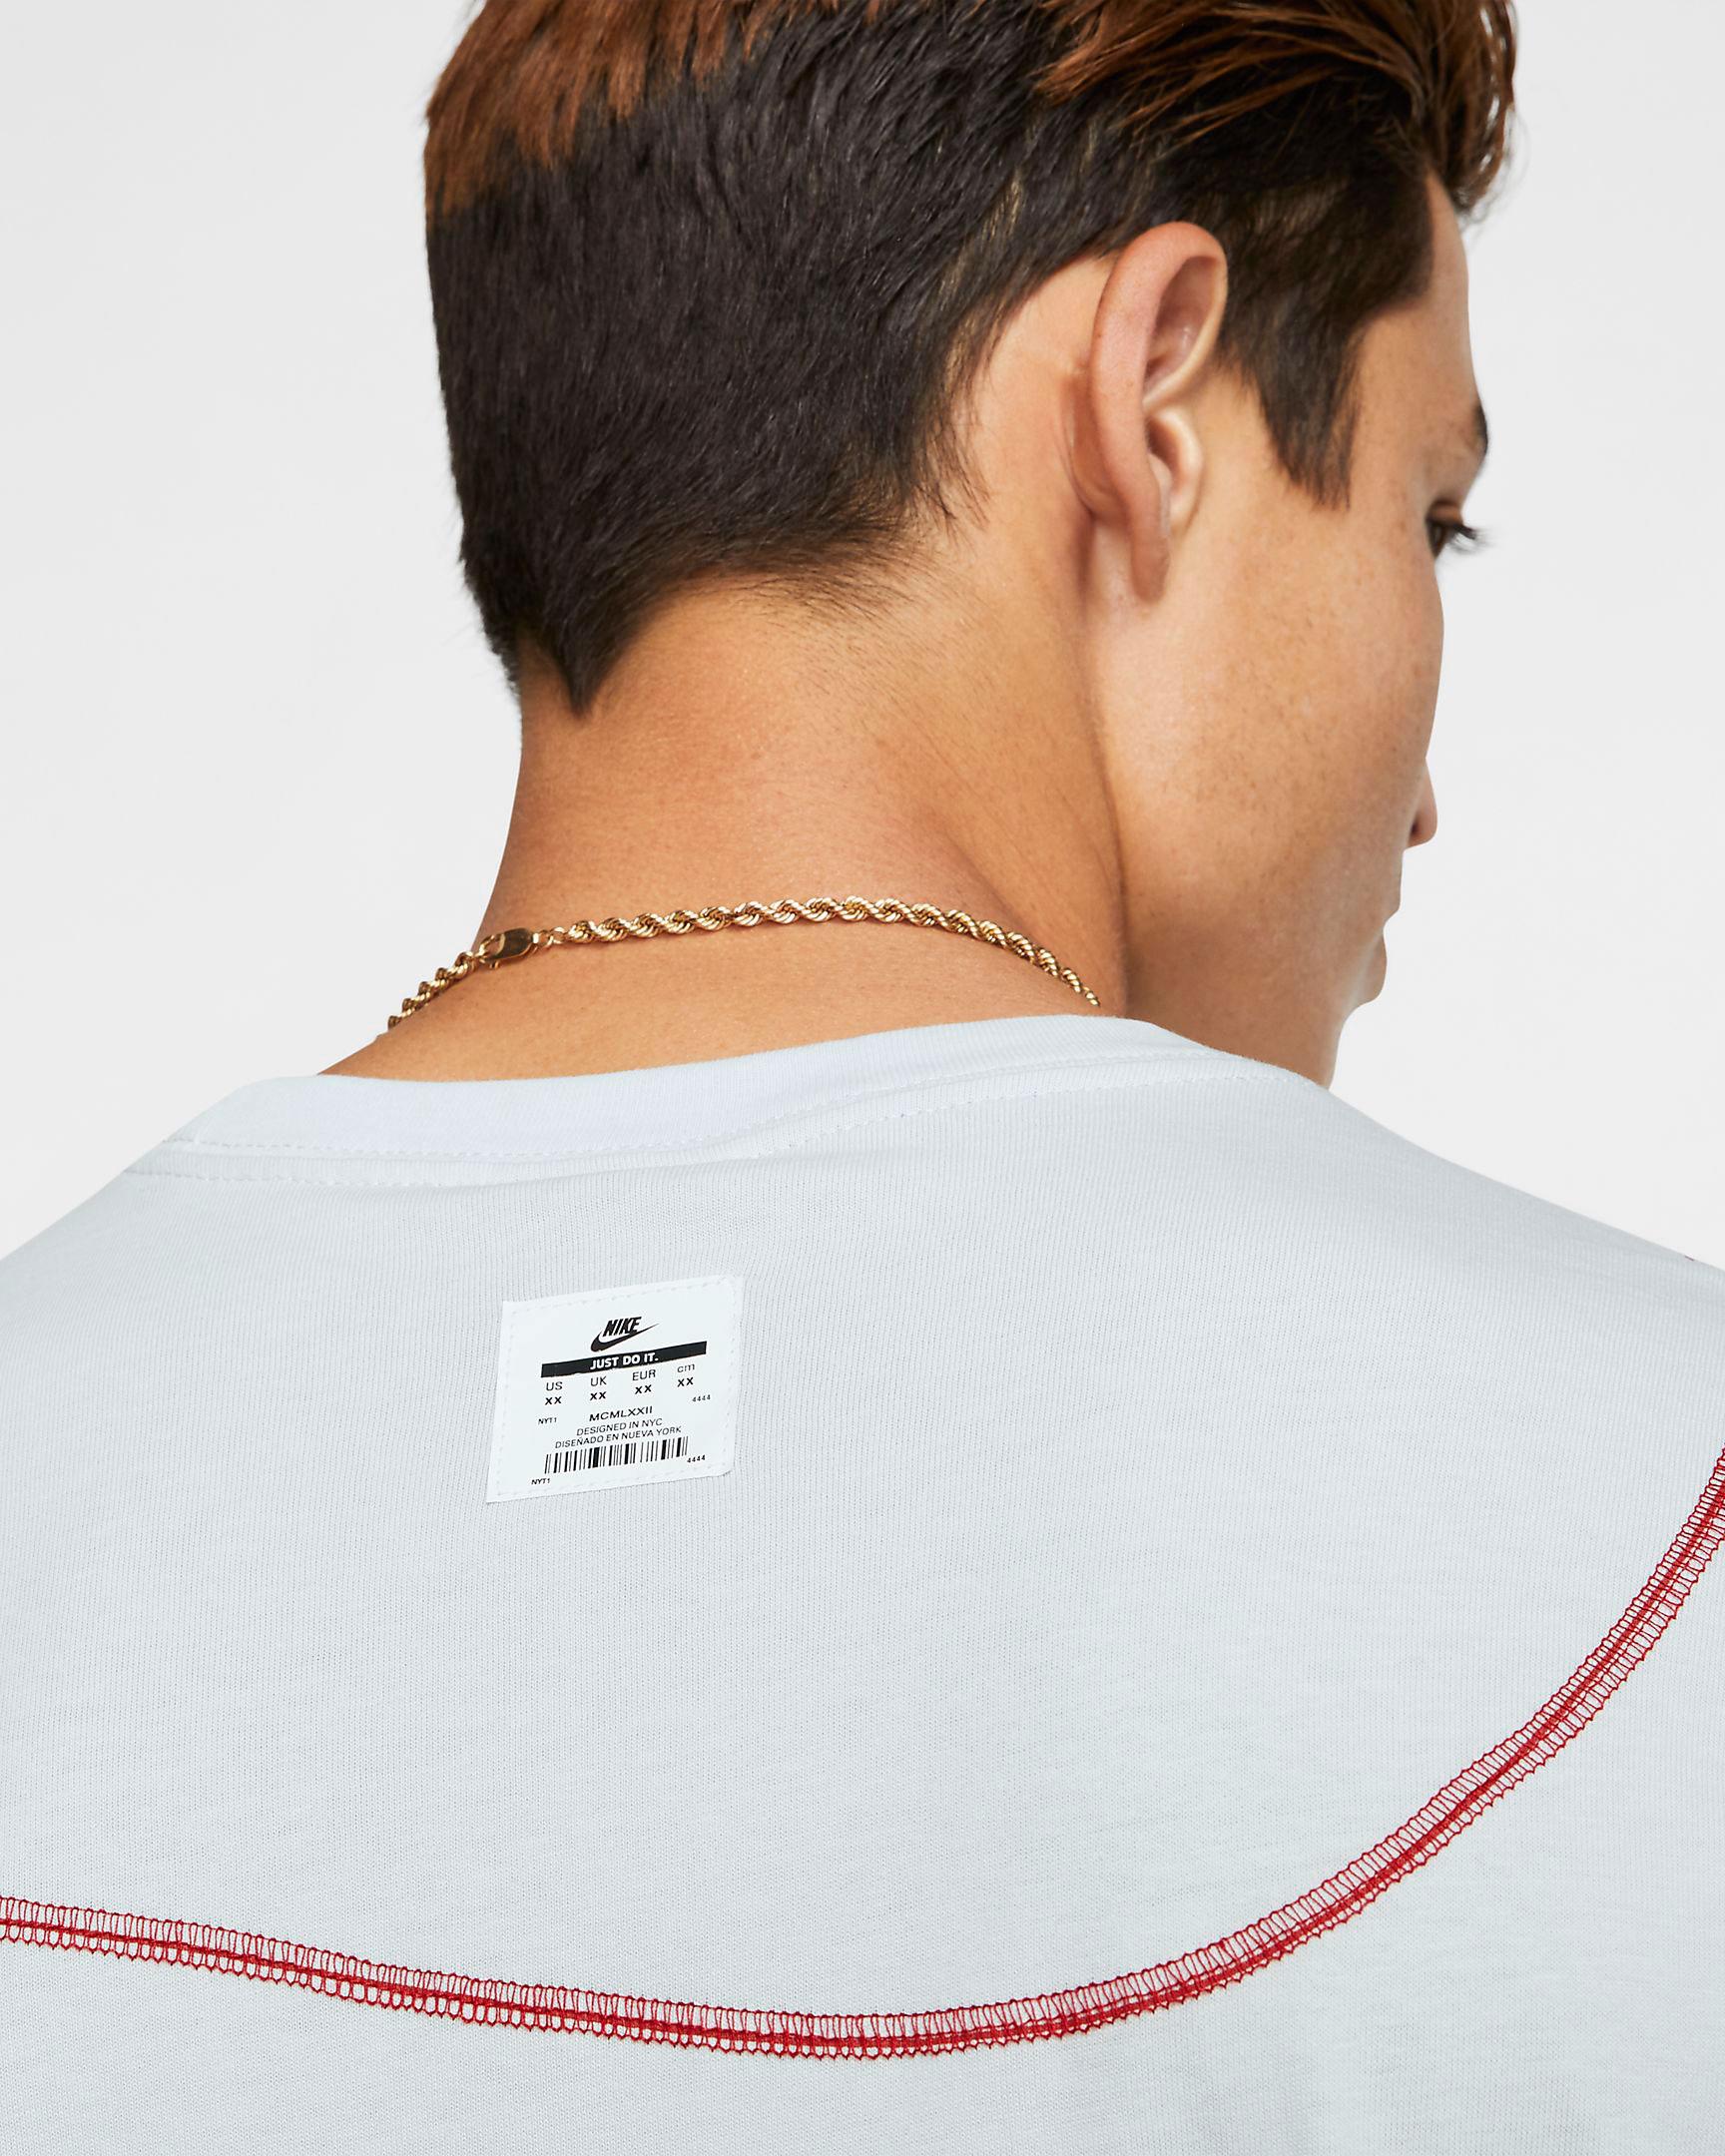 nike-air-max-inside-out-shirt